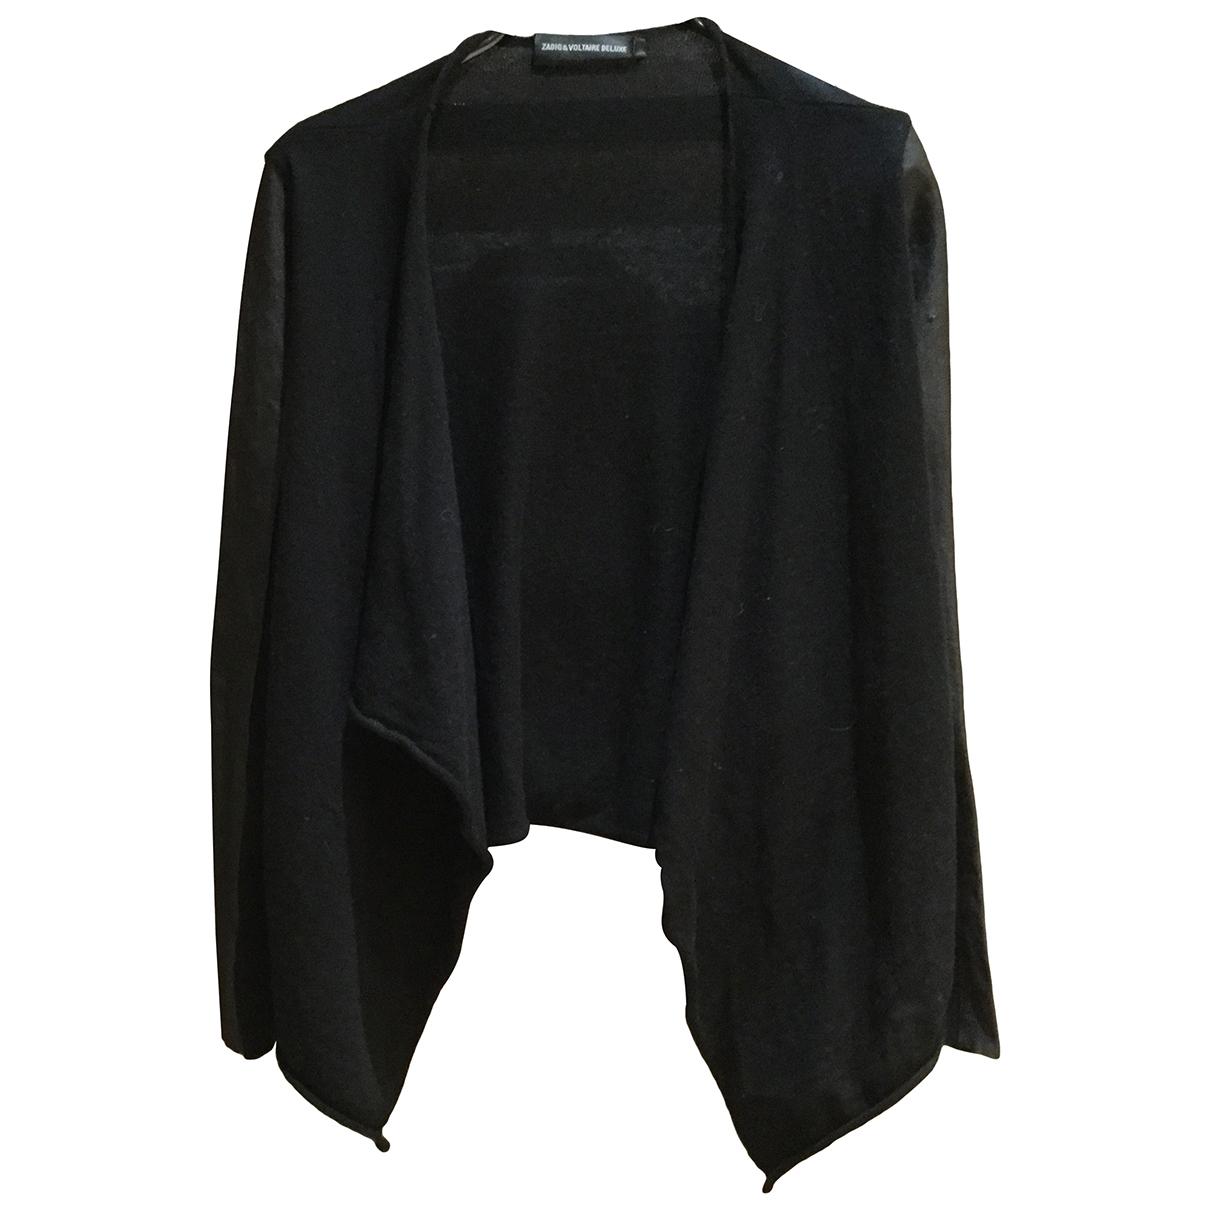 Zadig & Voltaire \N Black Wool Knitwear for Women S International